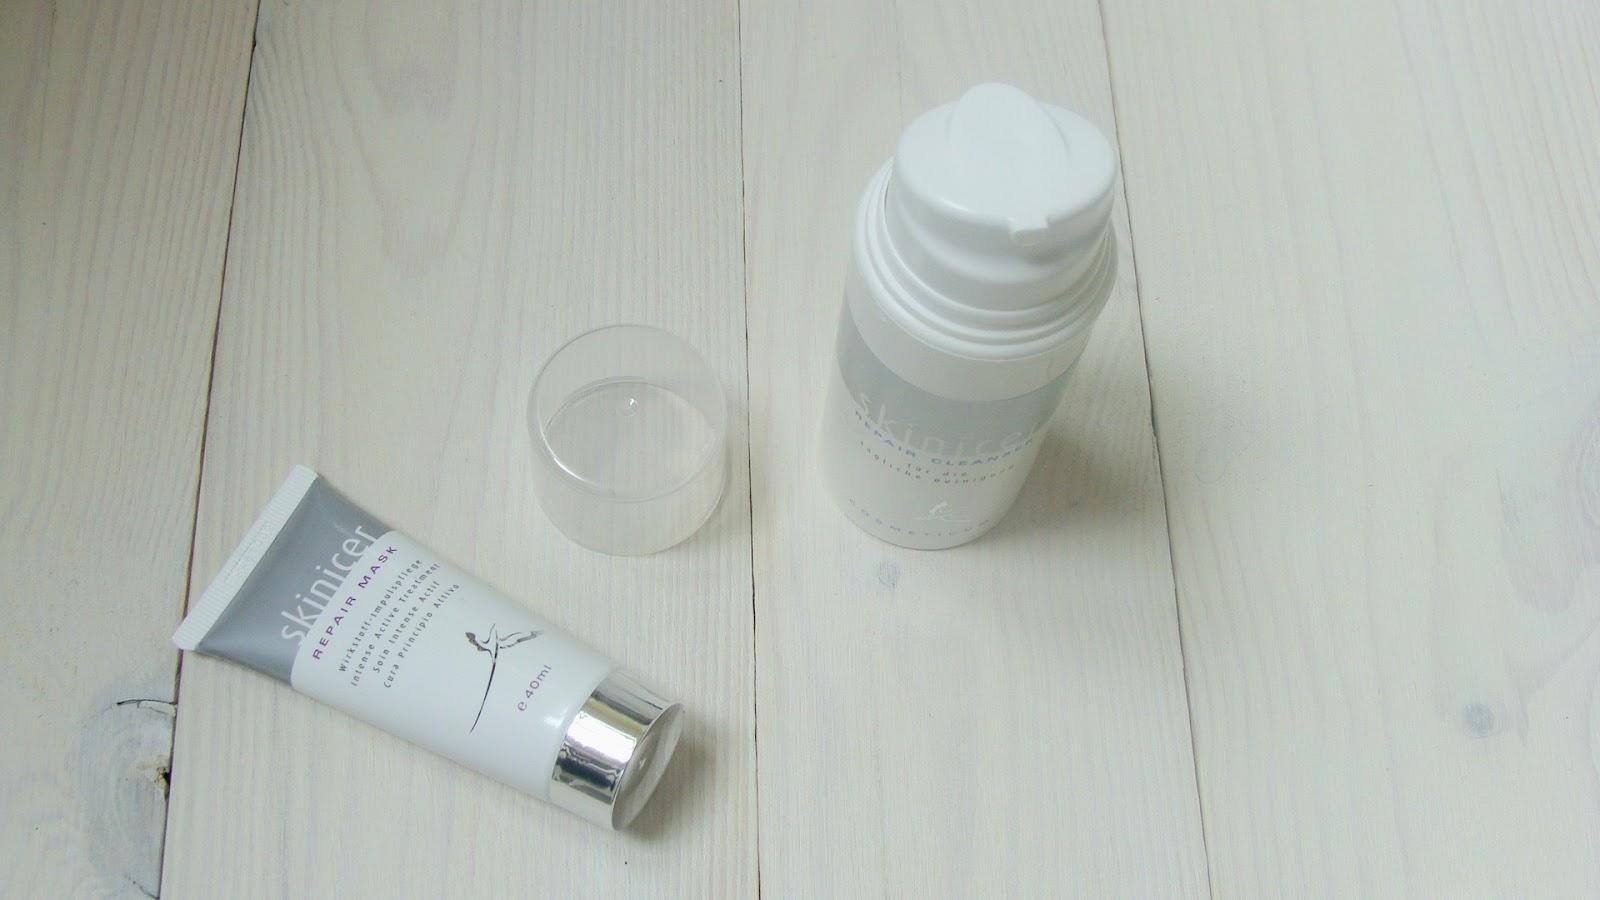 Kosmetyki Skinicer, Skinicer Repair Cleanser, Skinicer Repair Mask, cera problematyczna